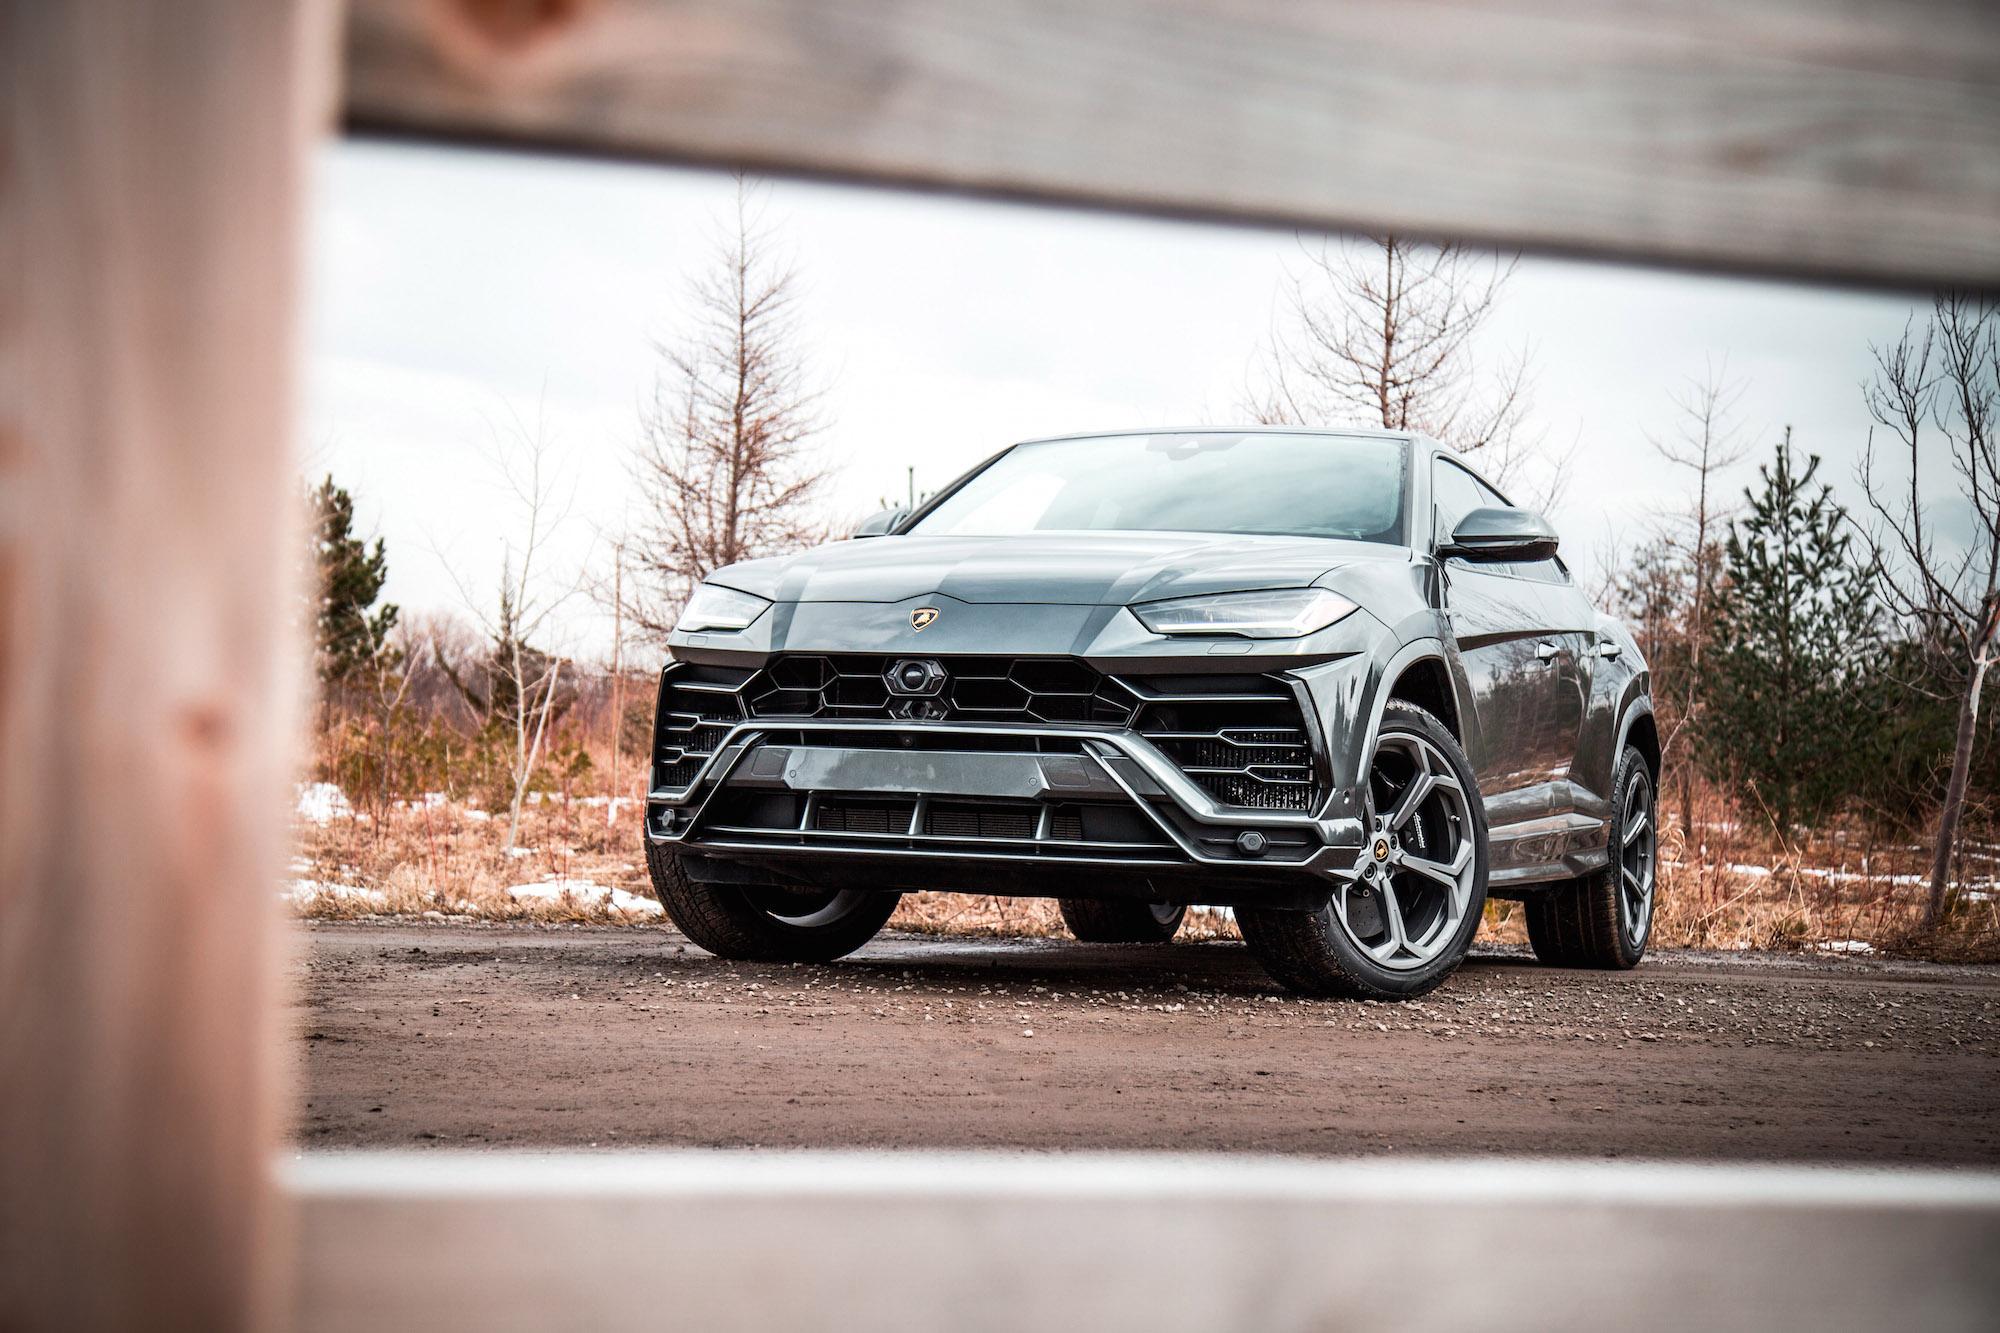 First Look: 2019 Lamborghini Urus | Canadian Auto Review